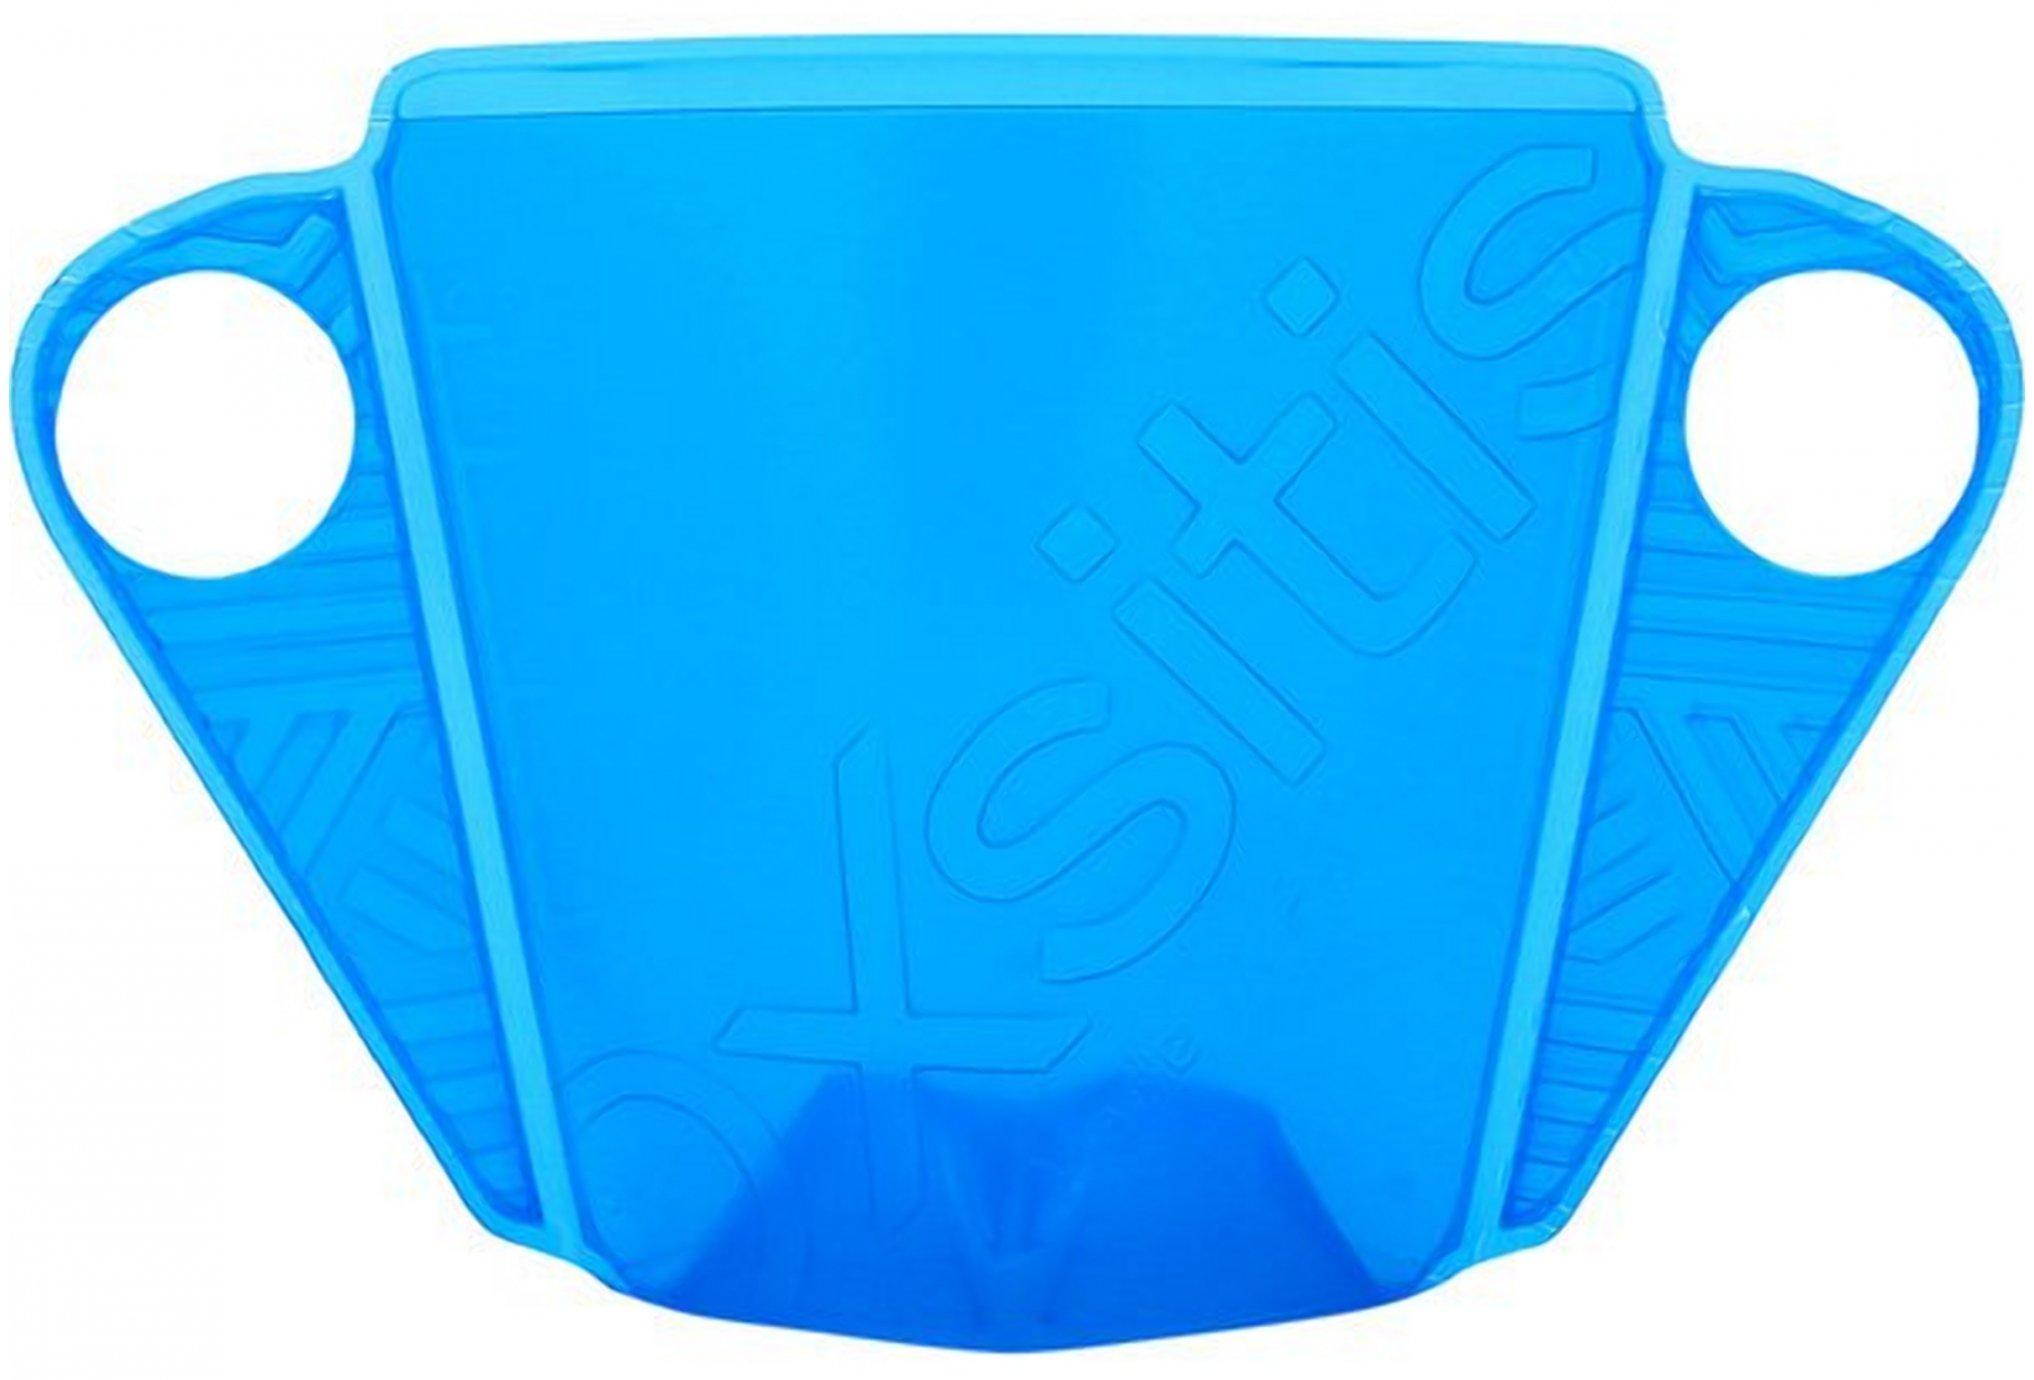 Oxsitis Easy Cup 200mL Sac hydratation / Gourde